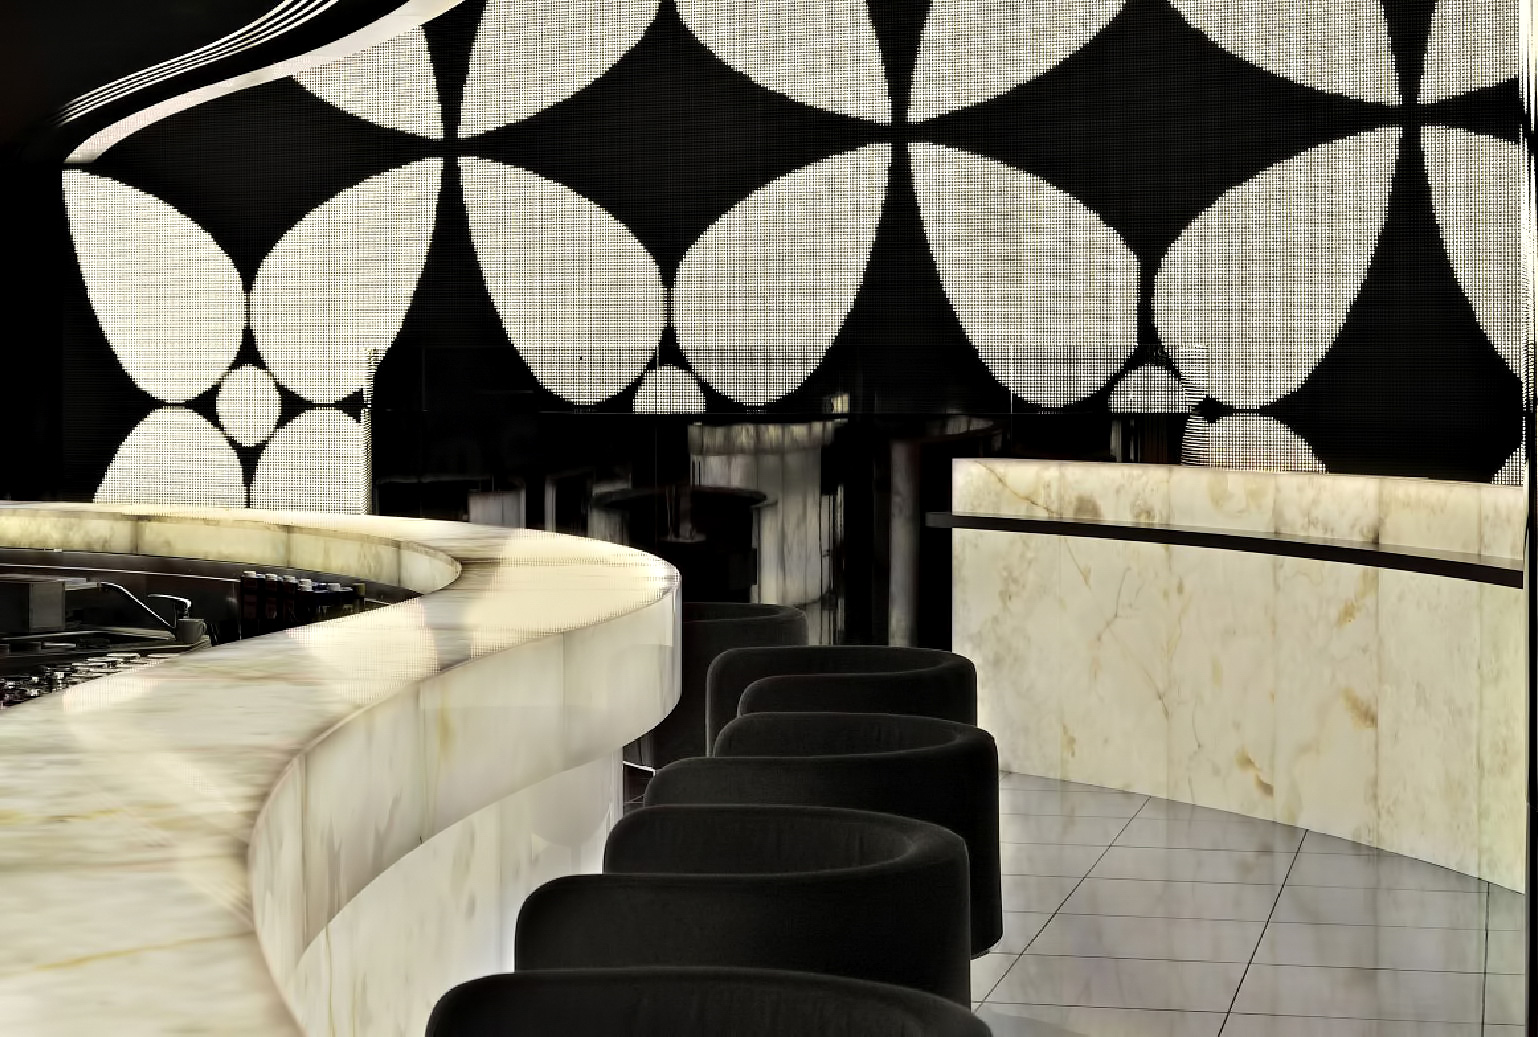 Armani Hotel Dubai - Burj Khalifa, Dubaï, Émirats arabes unis - Sièges de bar Armani Prive Night Club